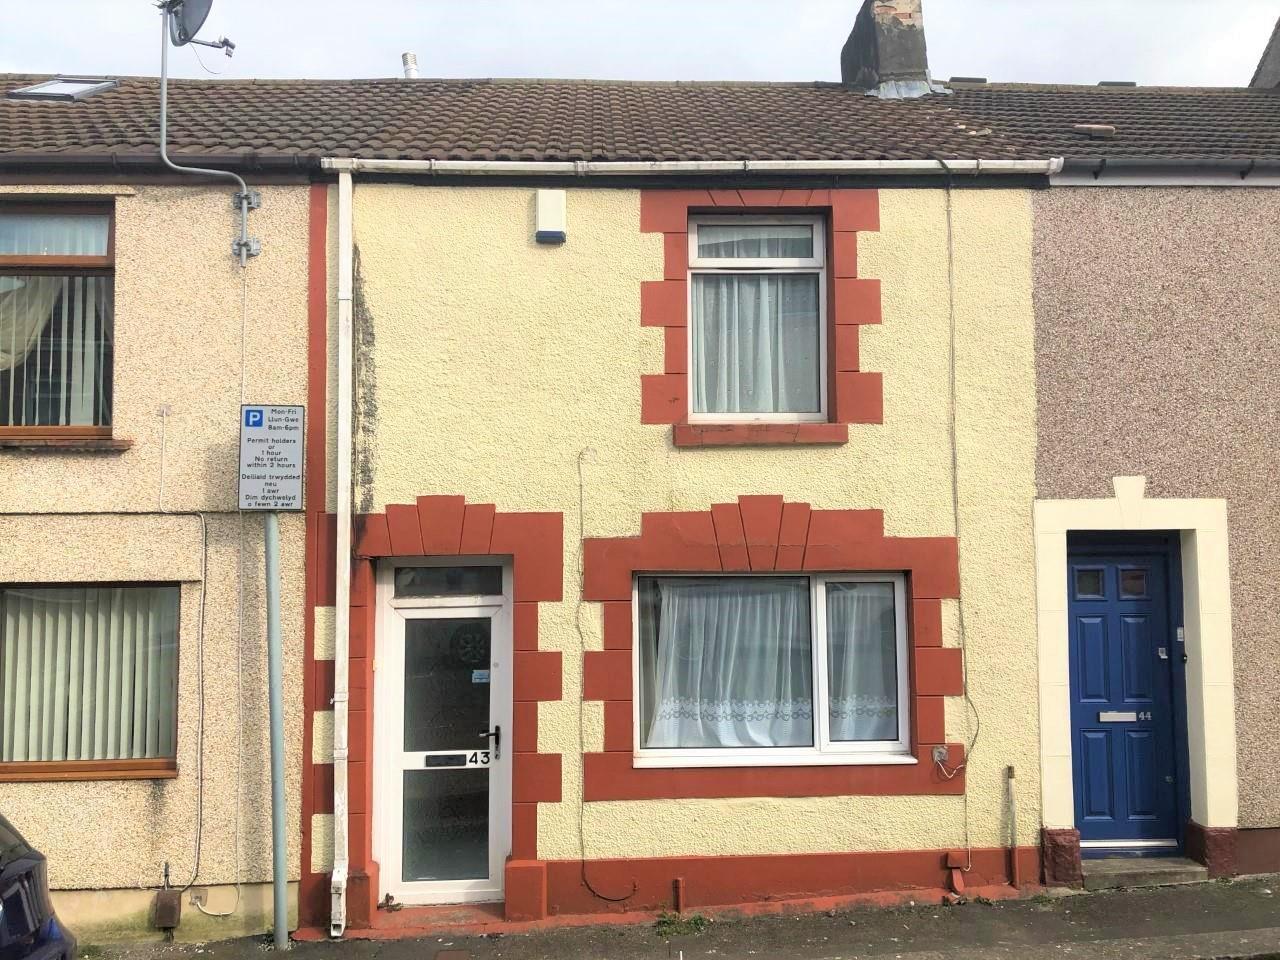 Tirpenry Street, Morriston, Swansea, SA6 8EB